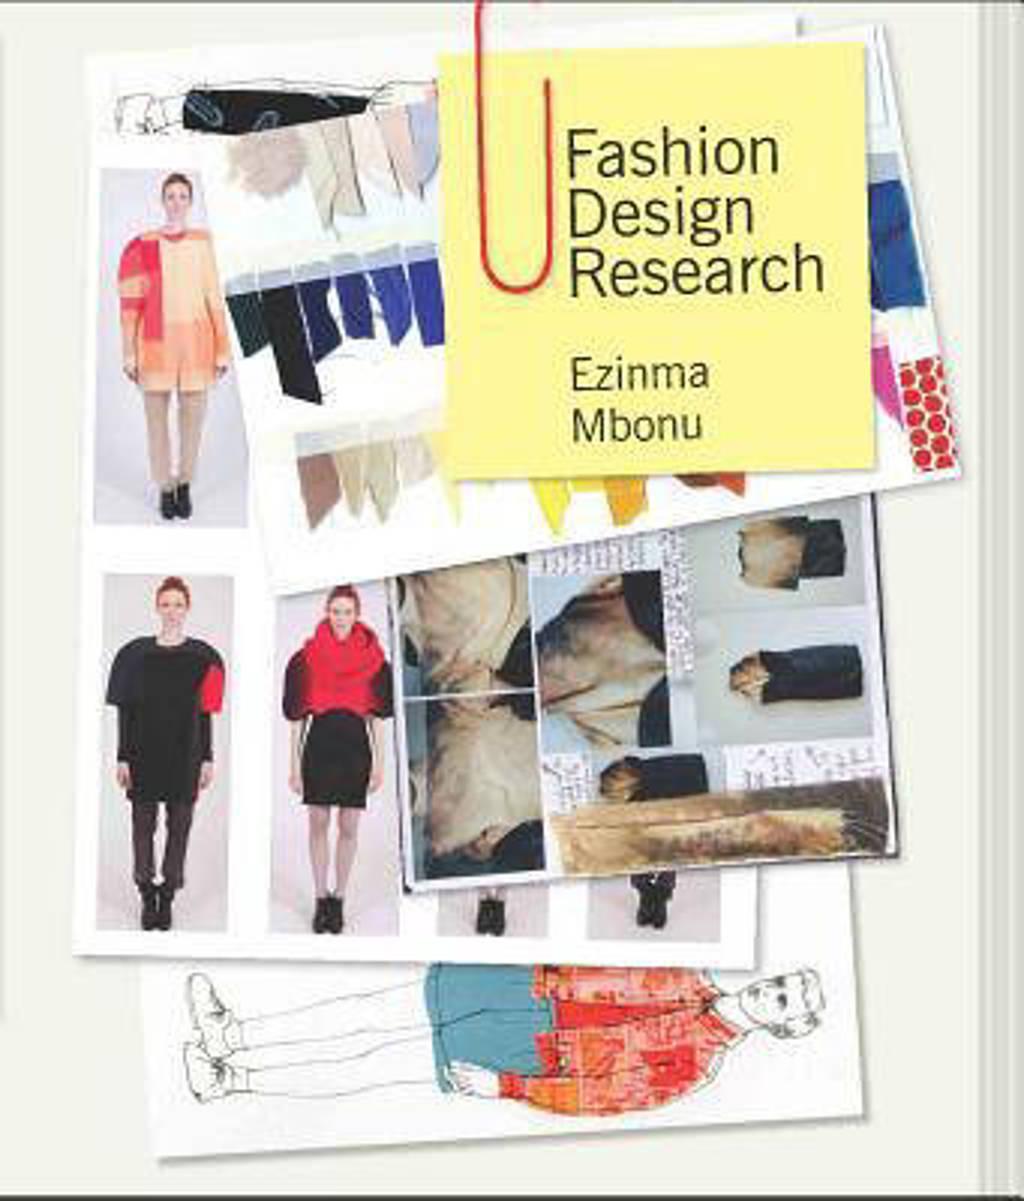 Fashion Design Research - Mbonu, Ezinma